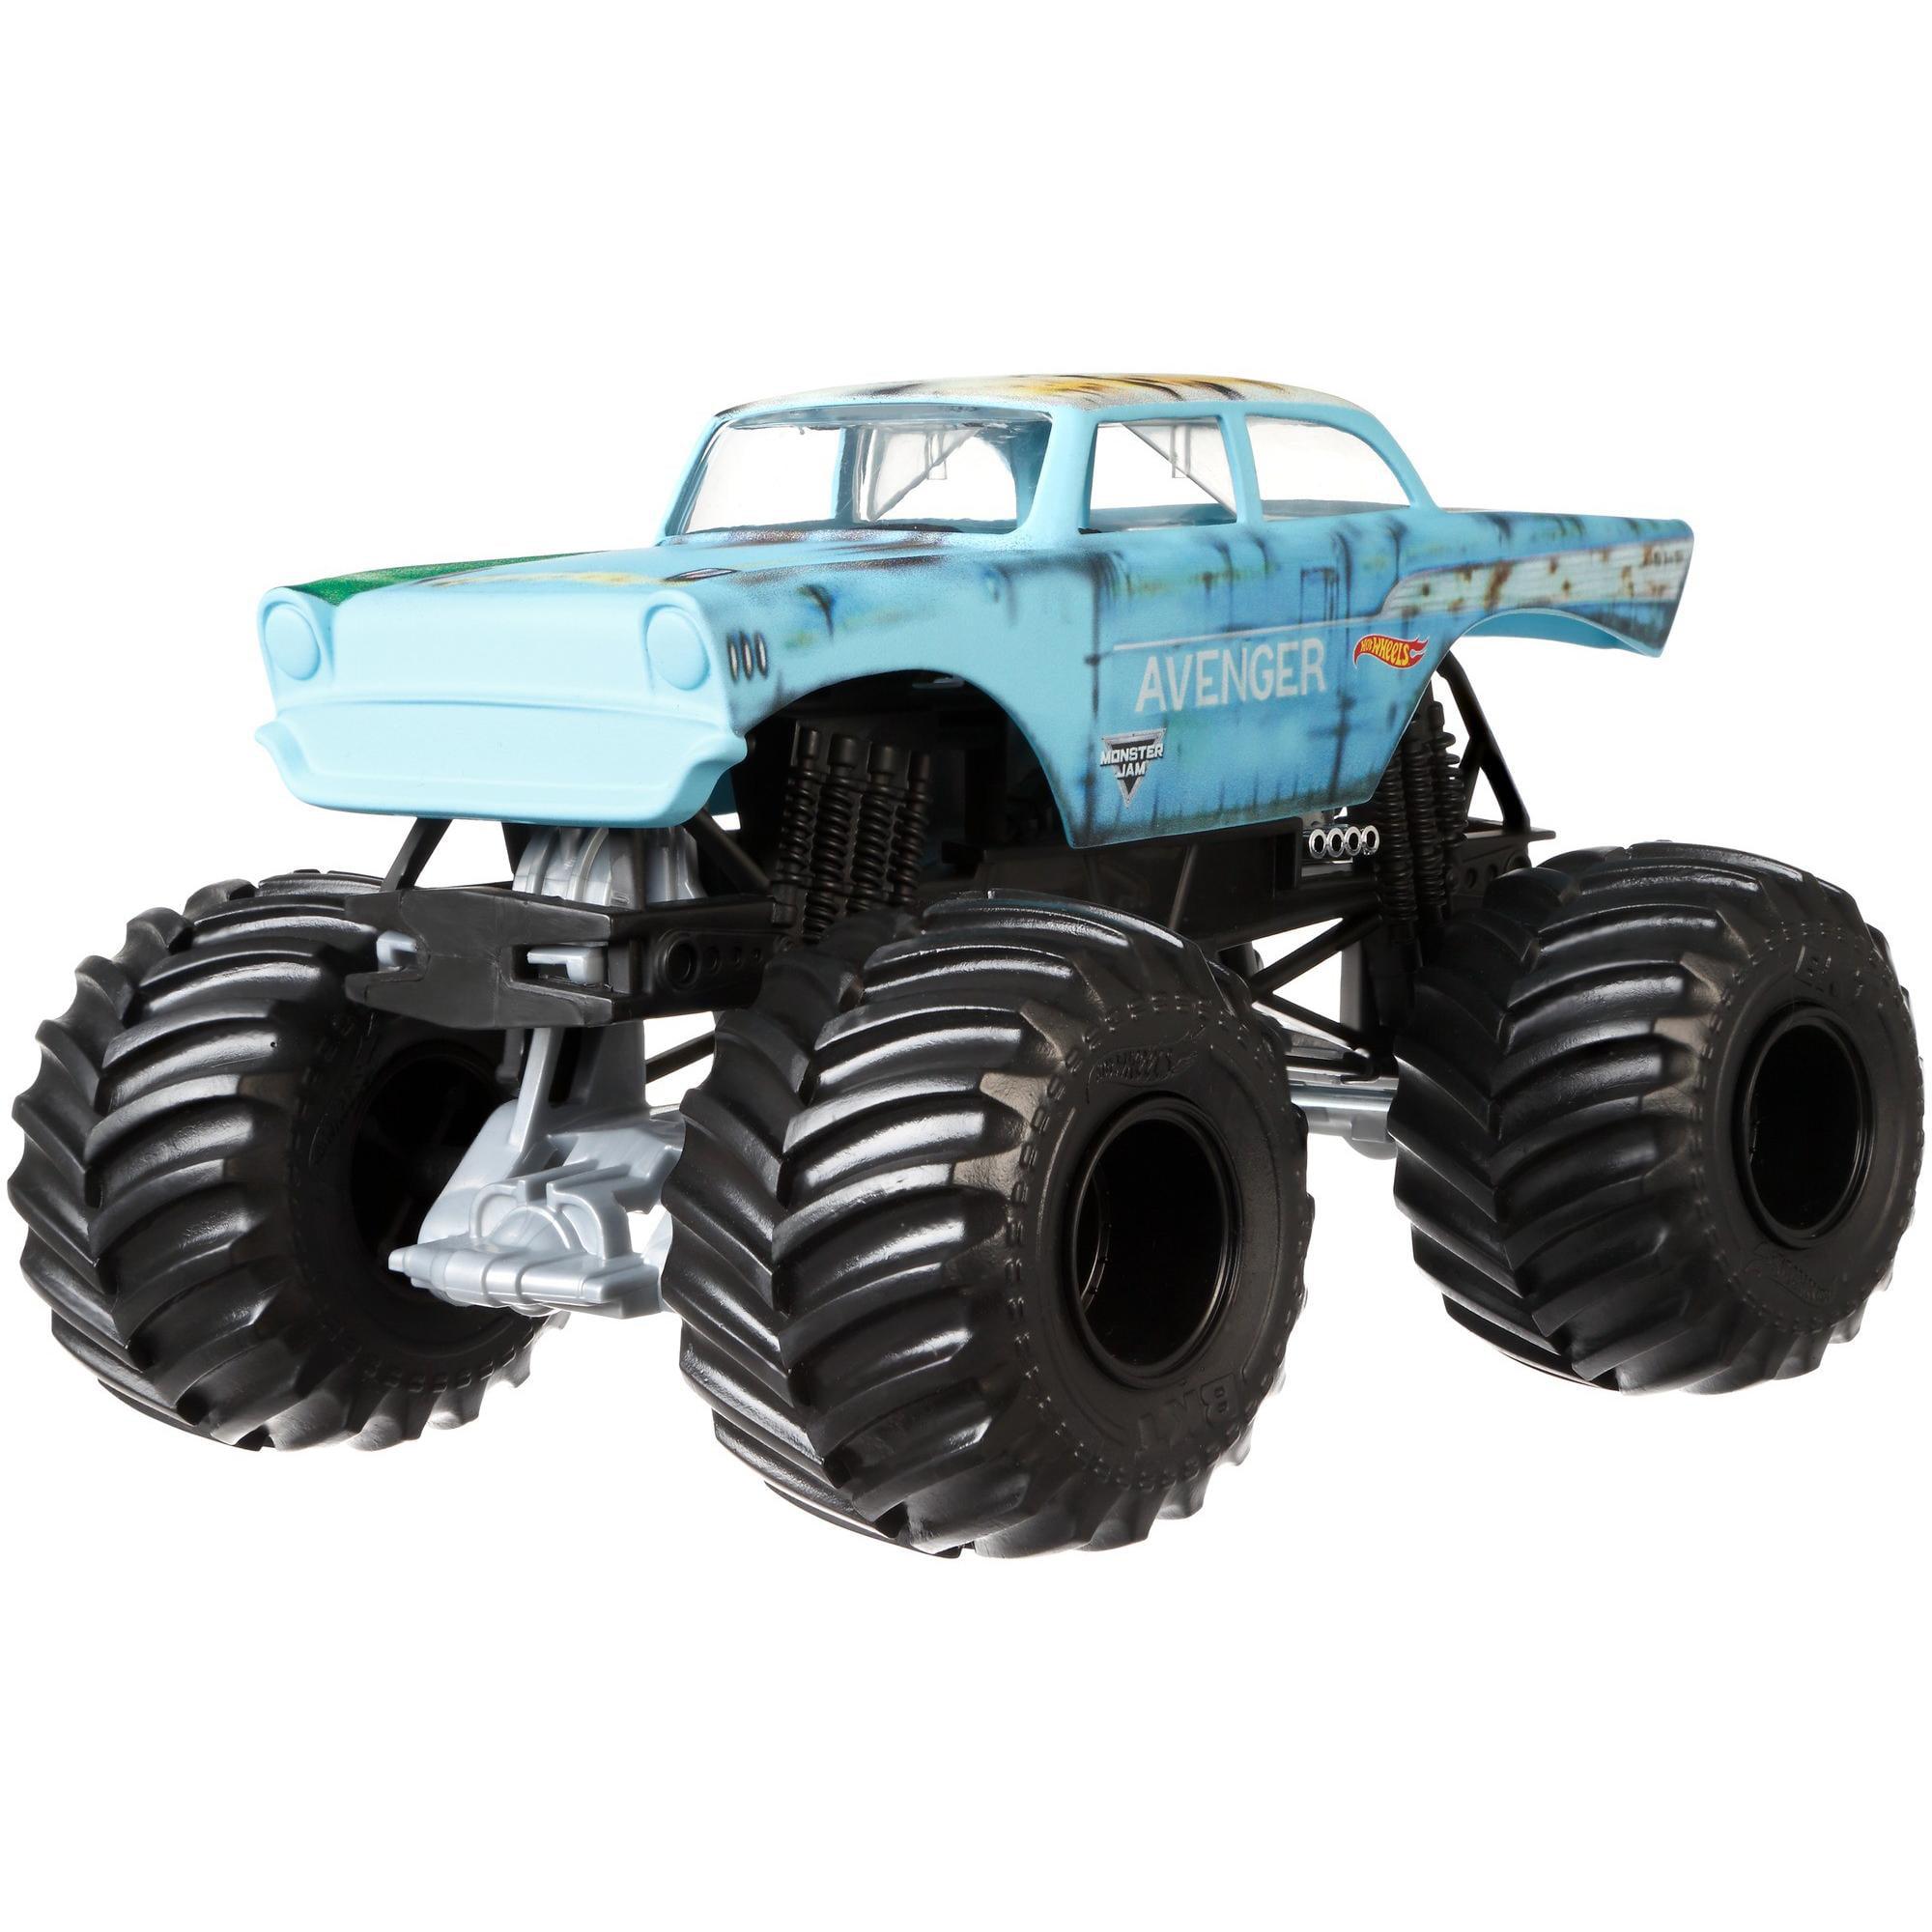 Hot Wheels Monster Jam 1:24 Scale Avenger Vehicle, 2017 World Finals by Mattel